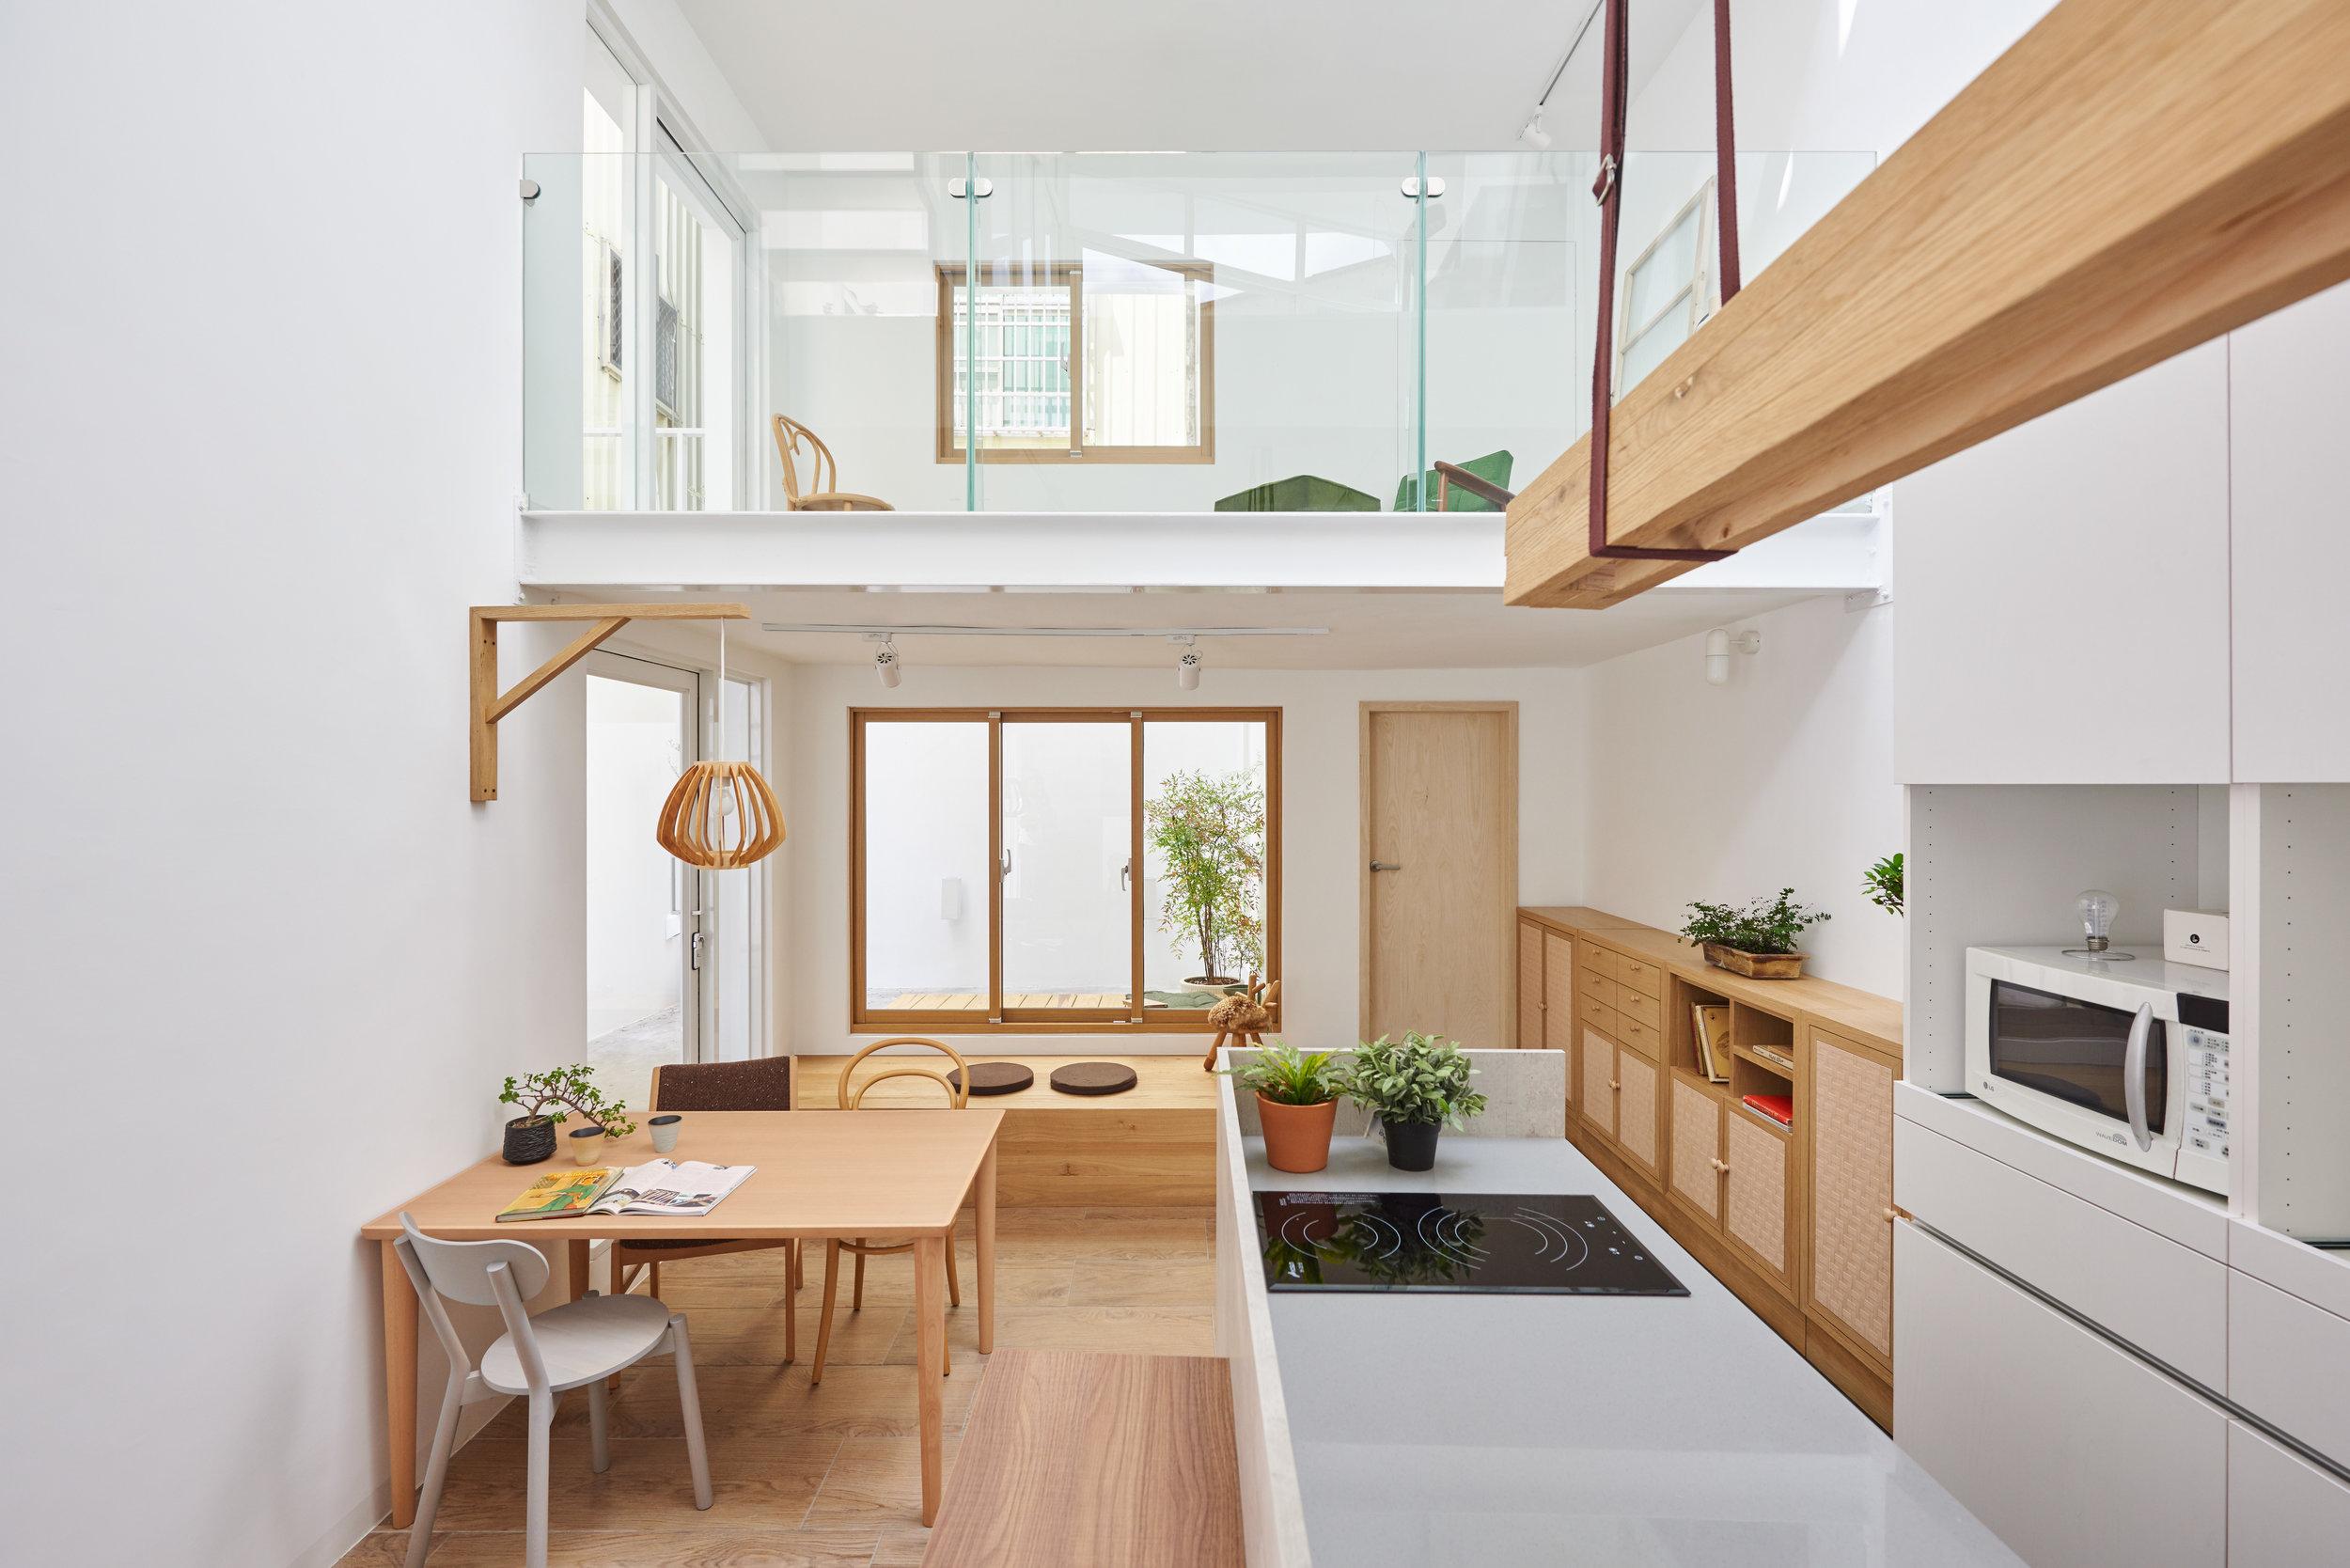 House H - Kaohsiung city, Taiwan | 2016